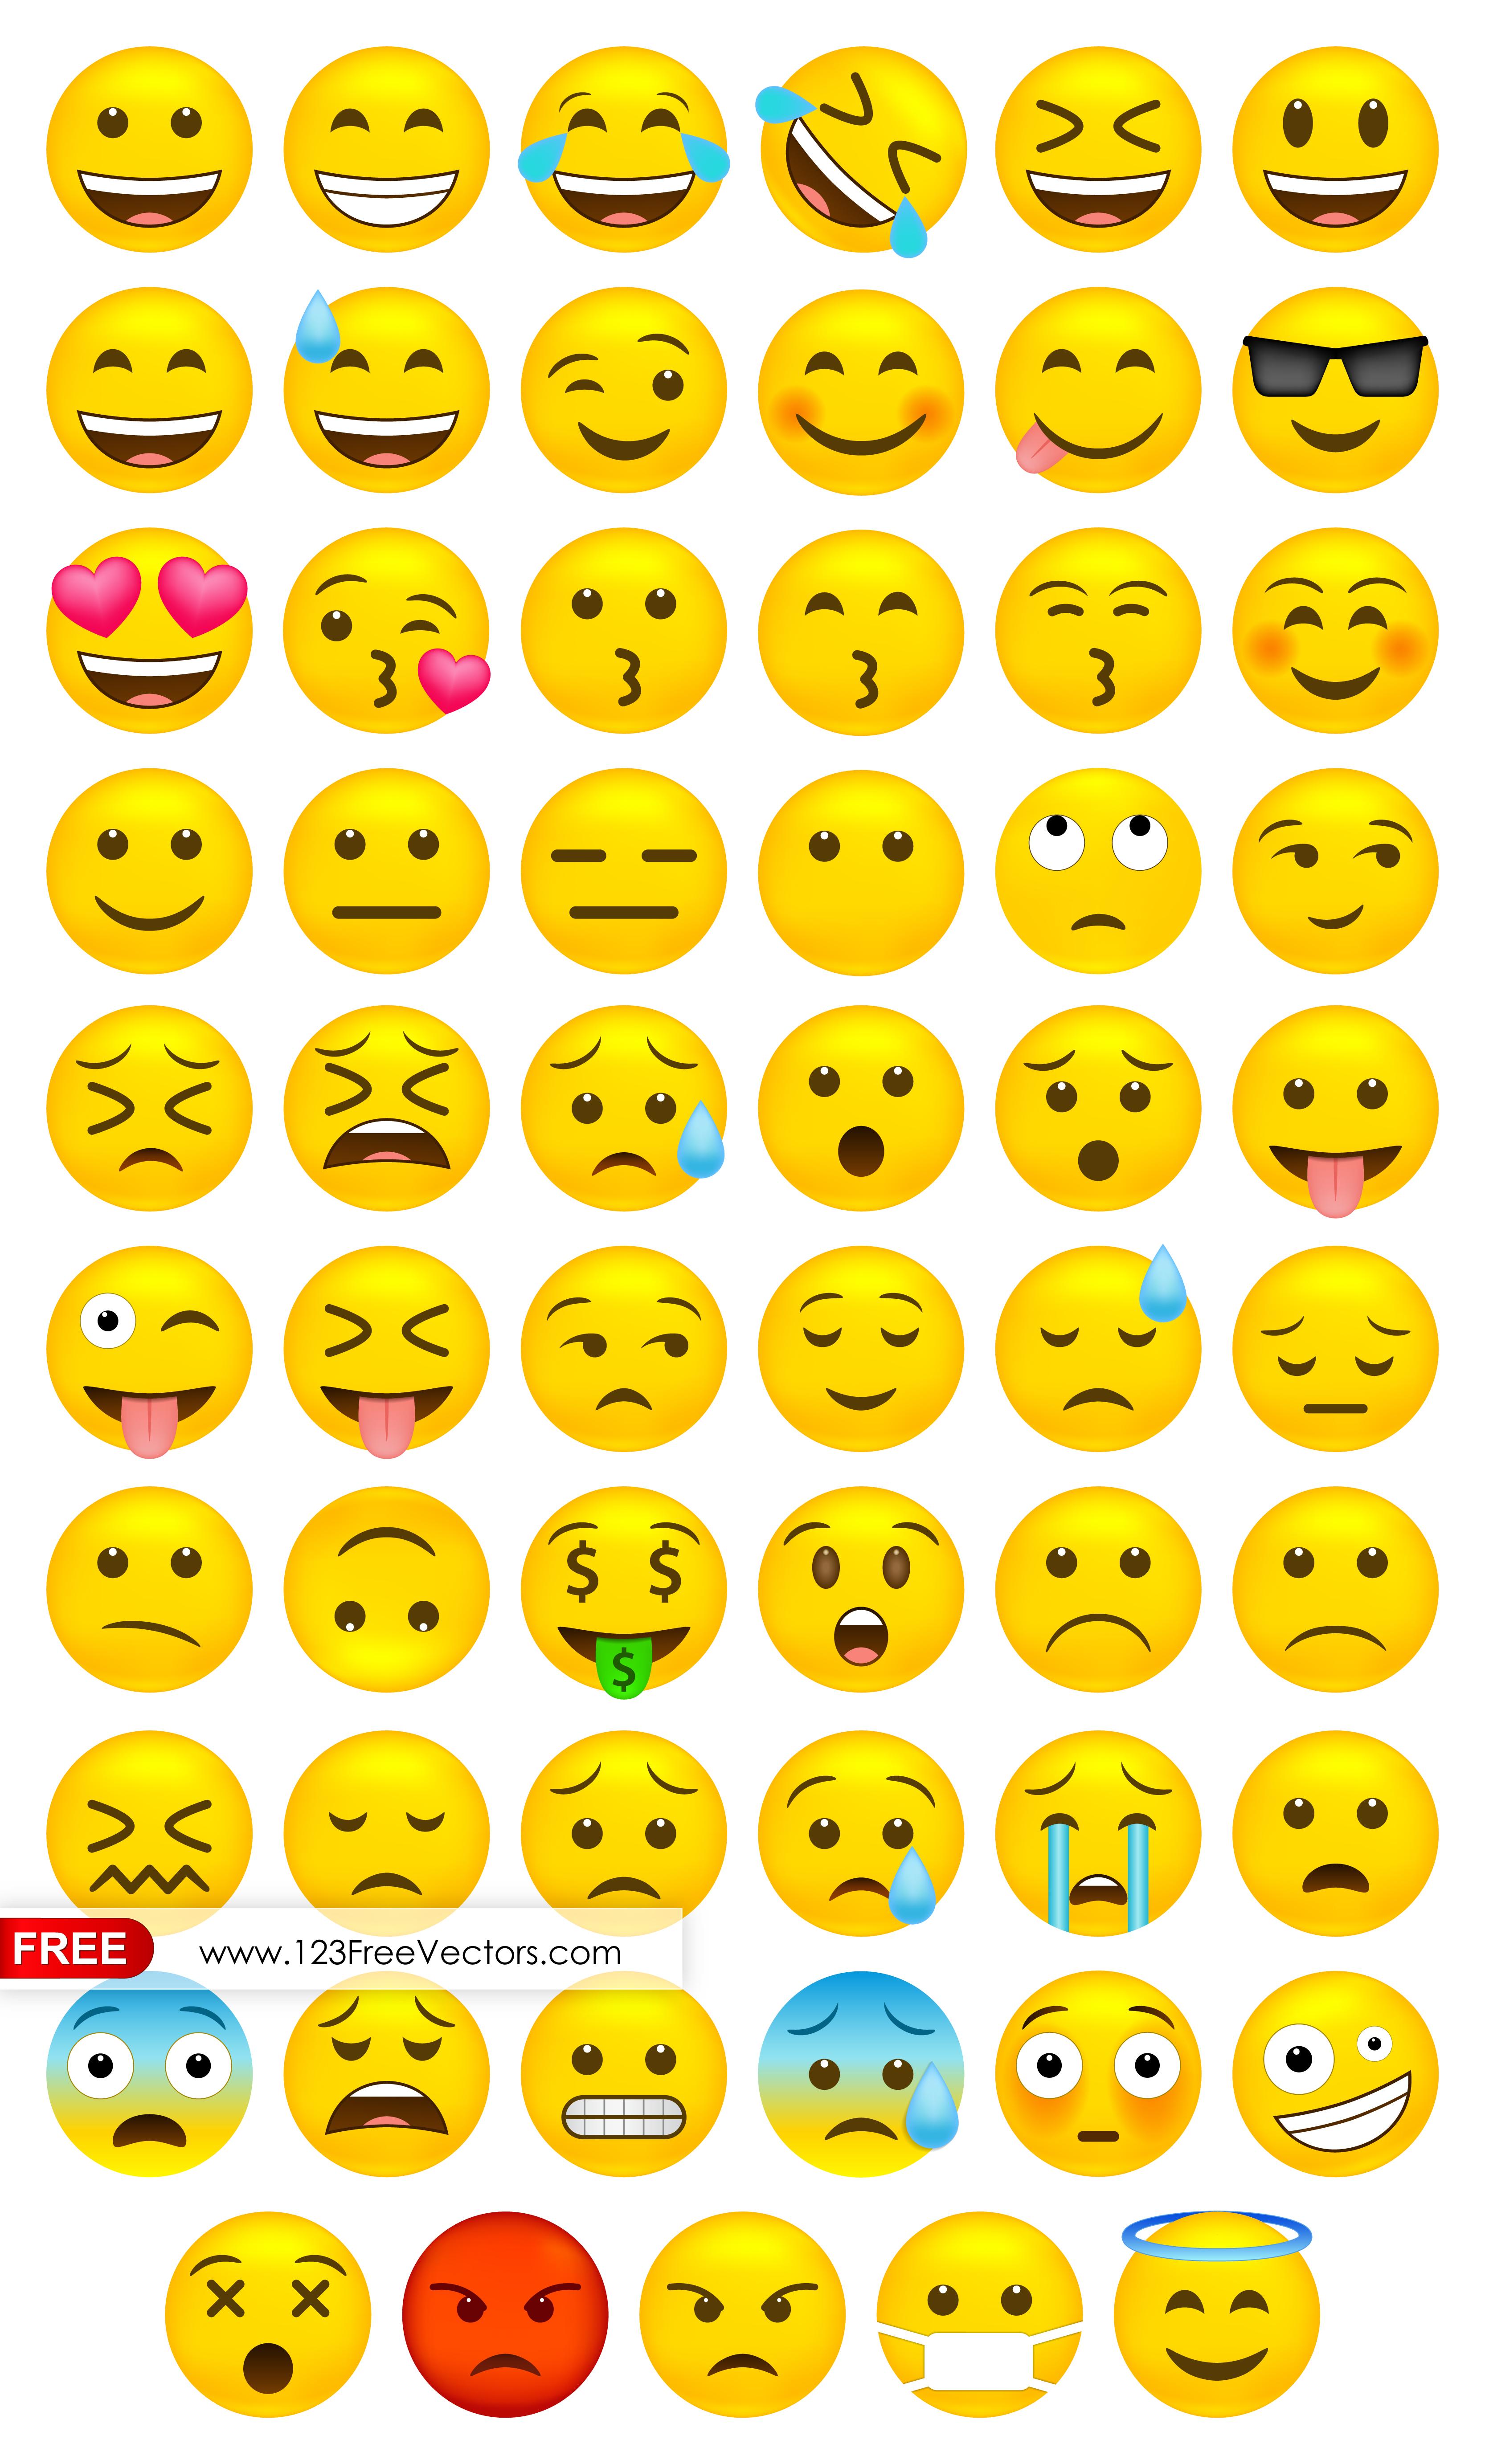 3333x5532 Whatsapp Emoji Vector Free Download 123freevectors